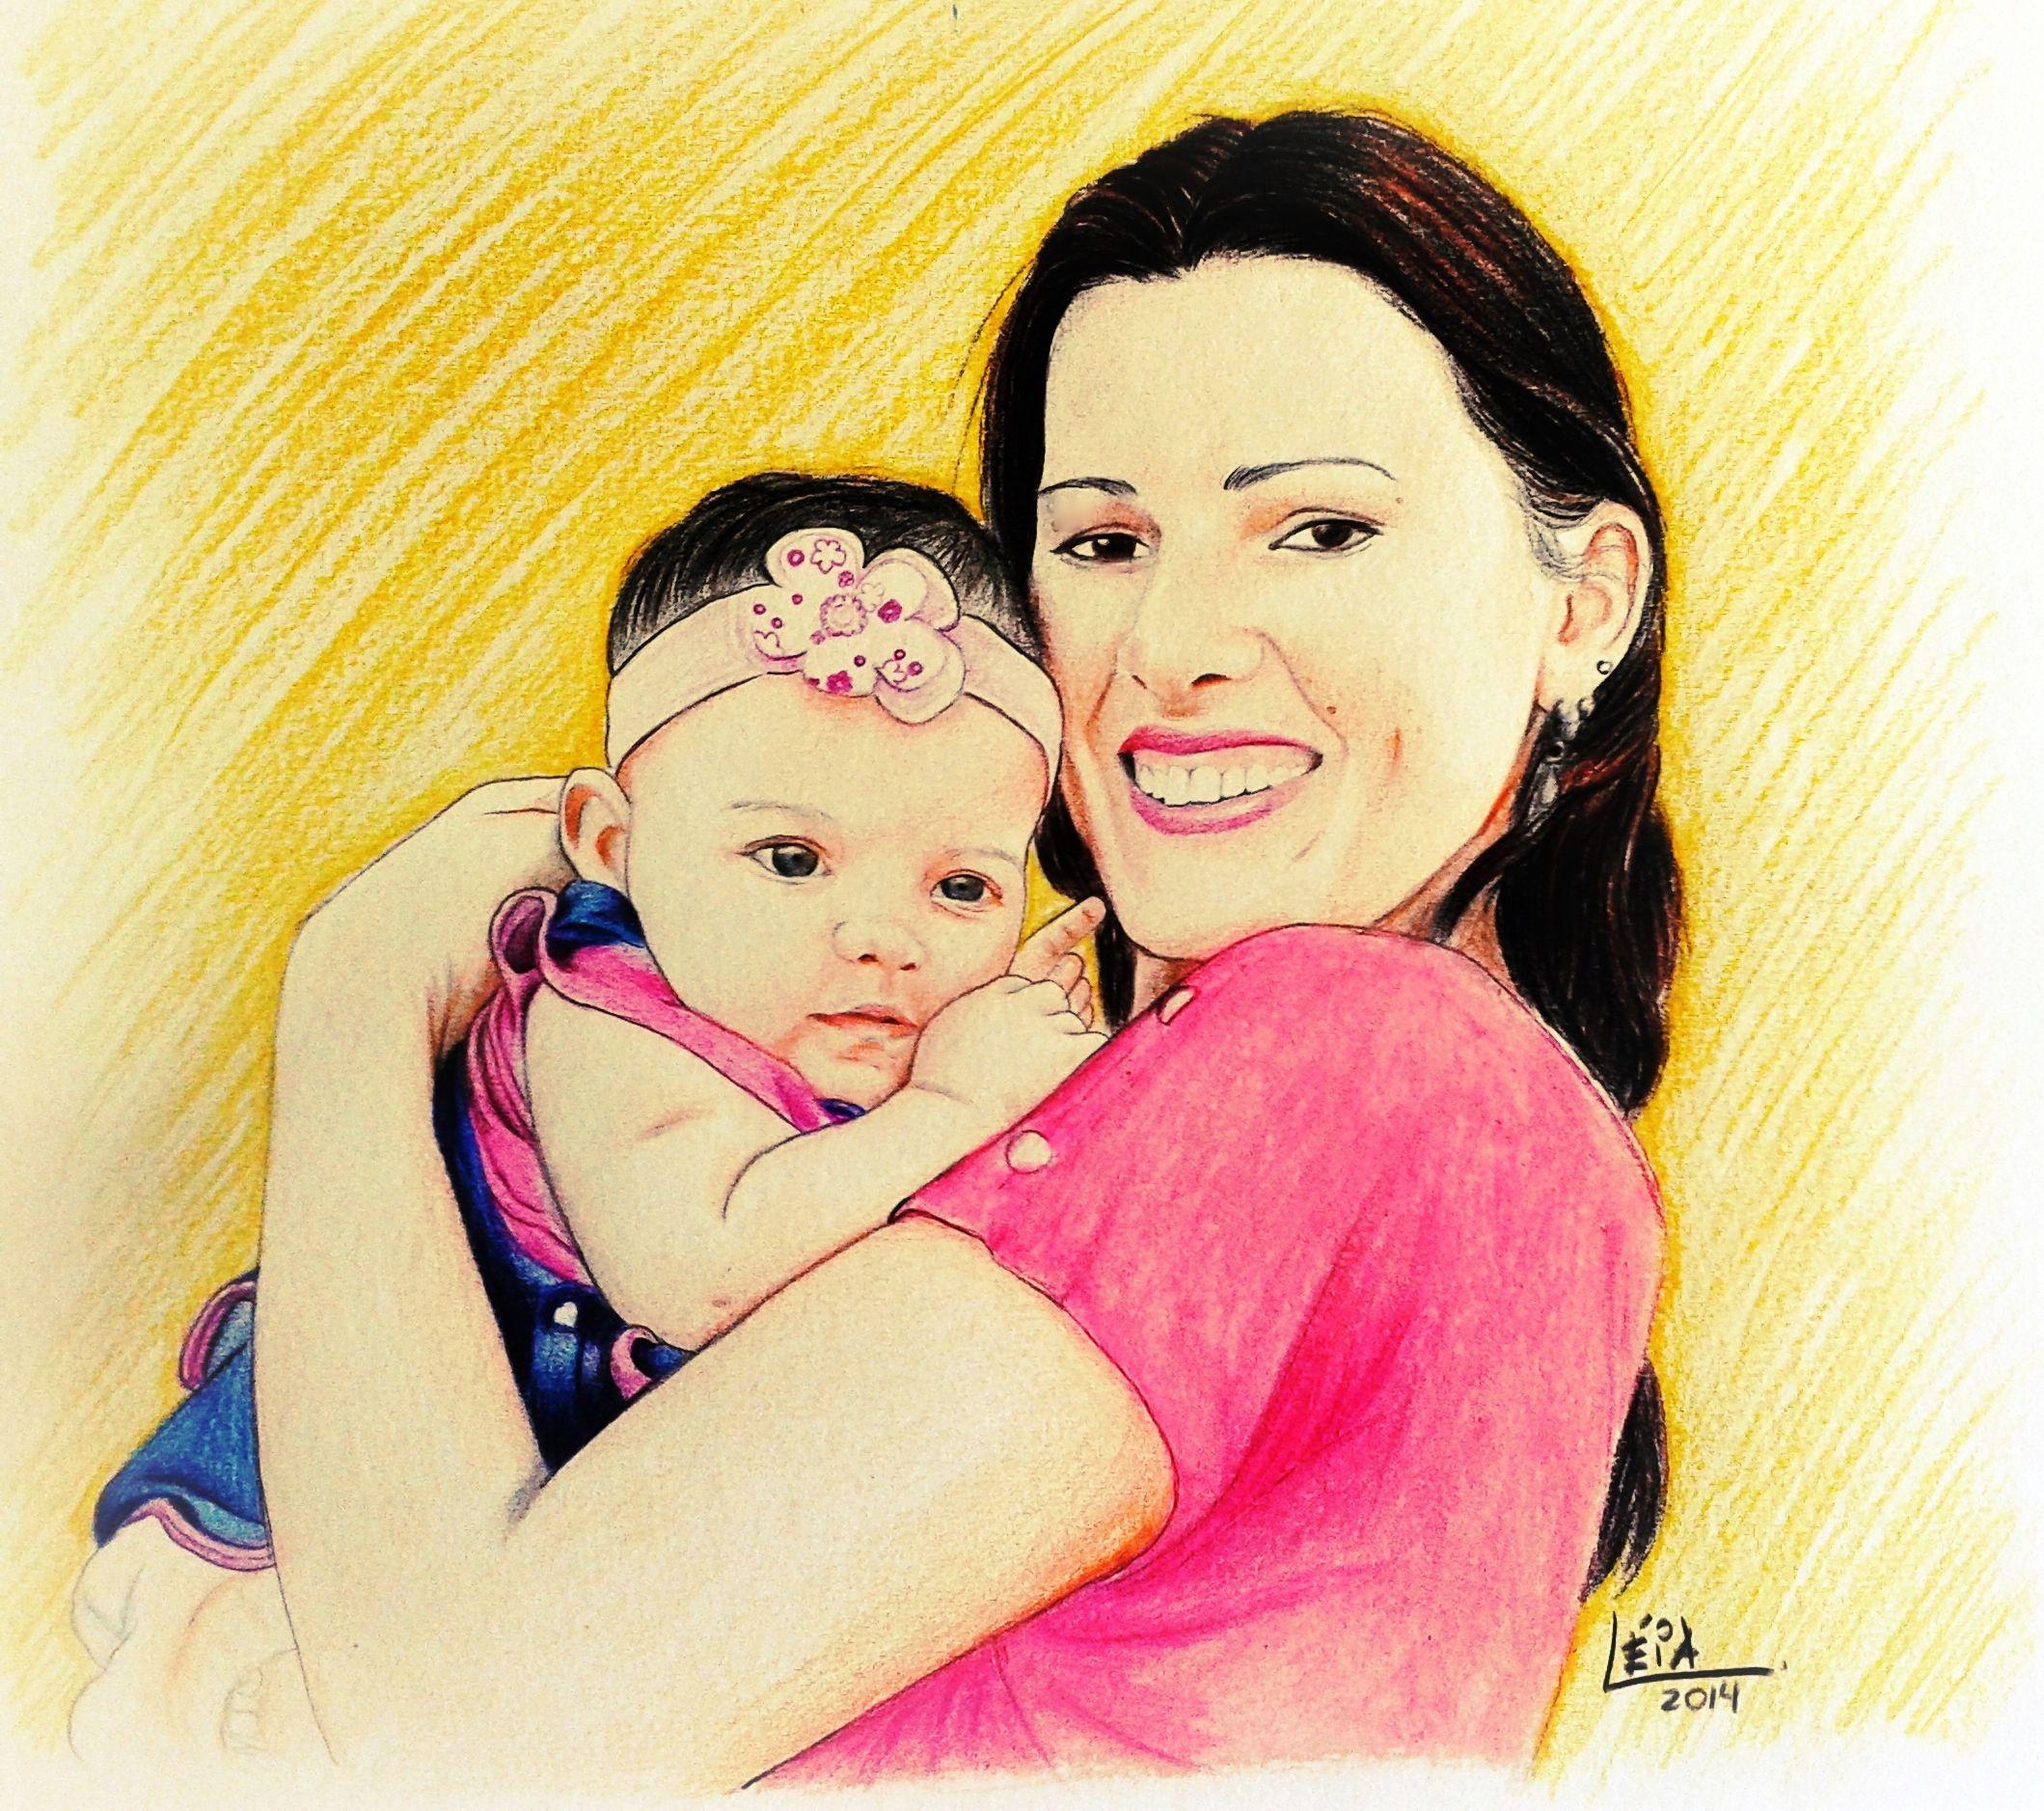 Rosy and Elizabeth - Mãe e filha